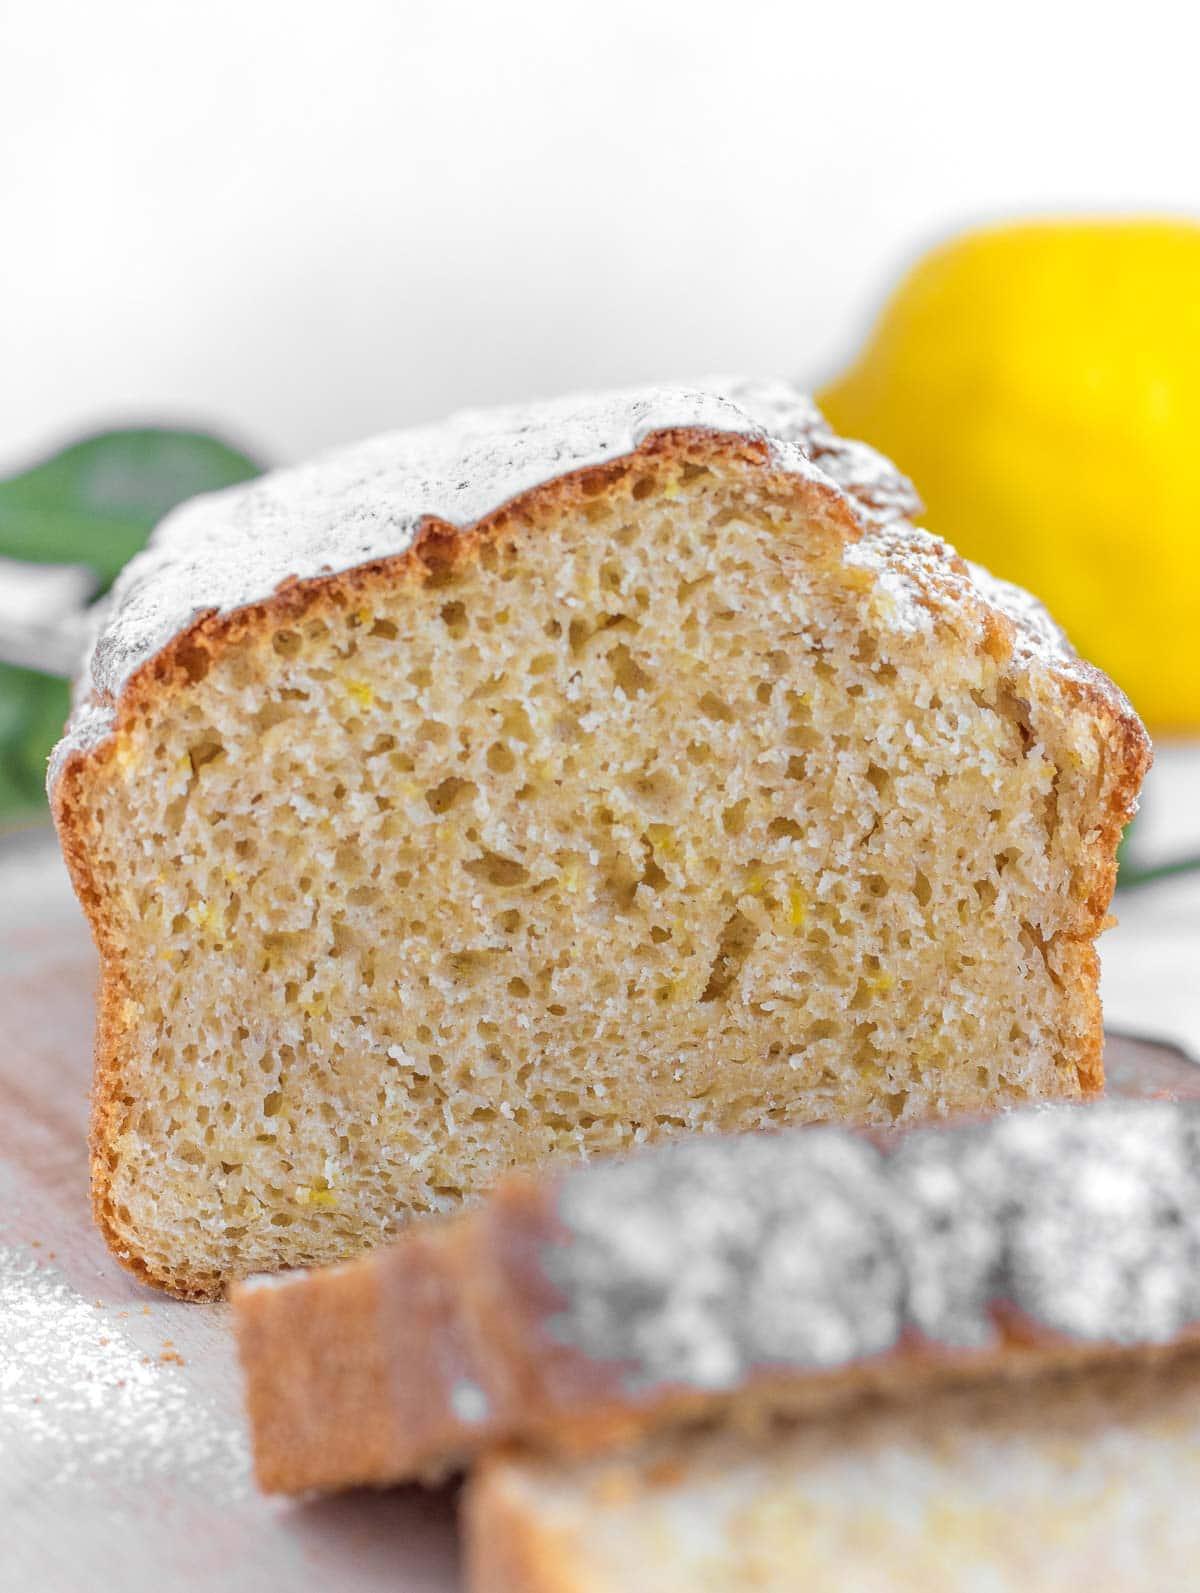 plumcake vegan al limone sofficissimo